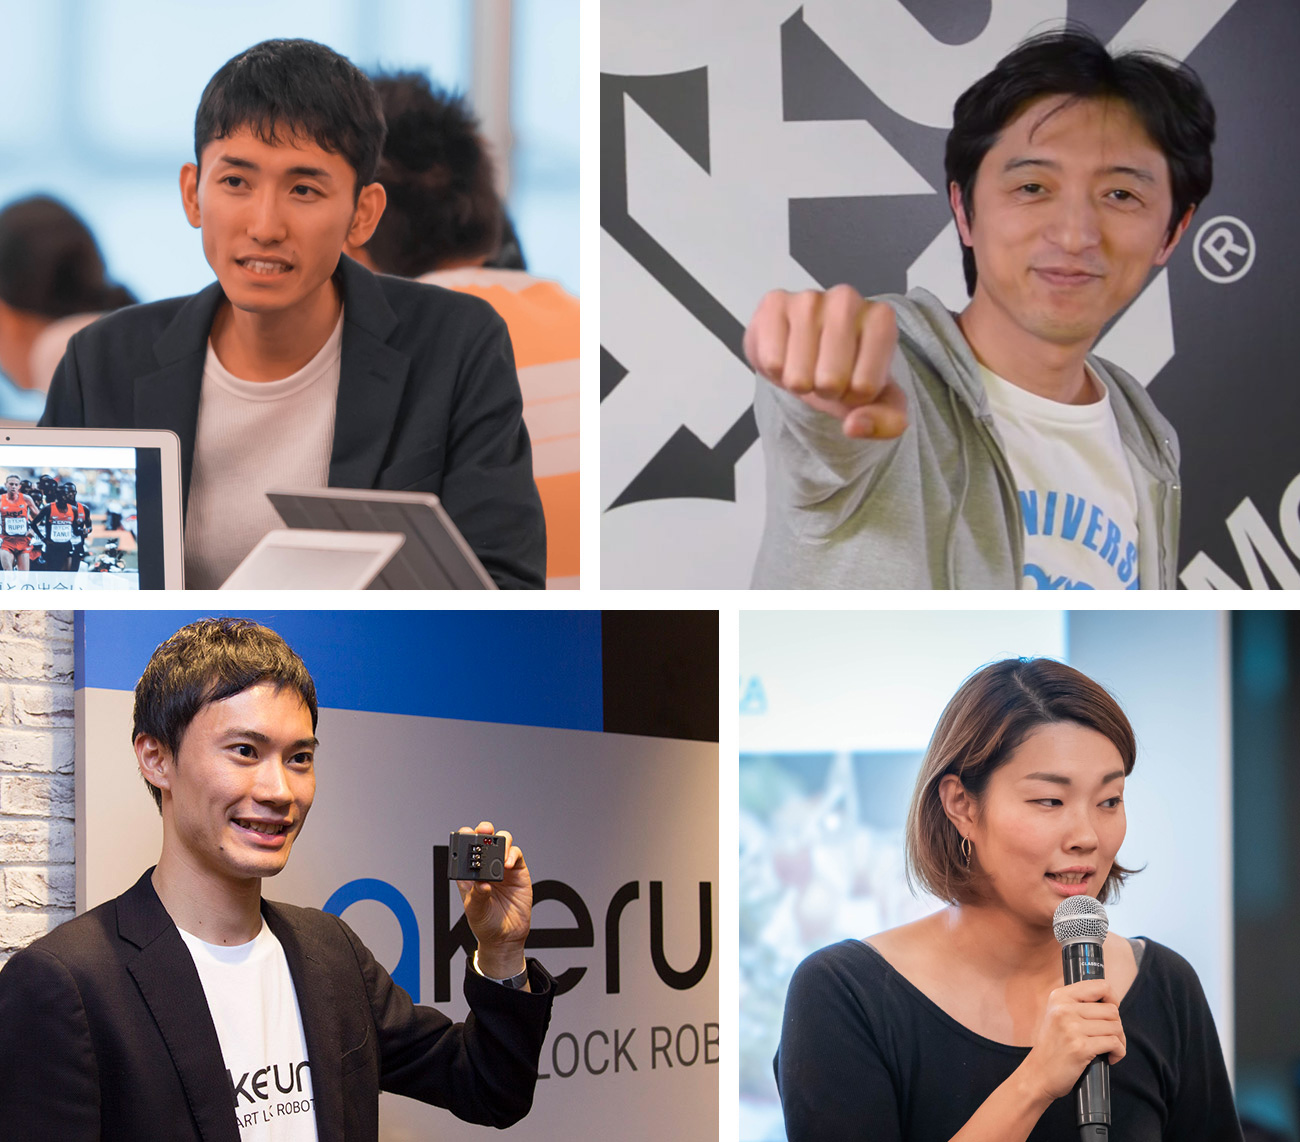 Gaiax entrepreneurs